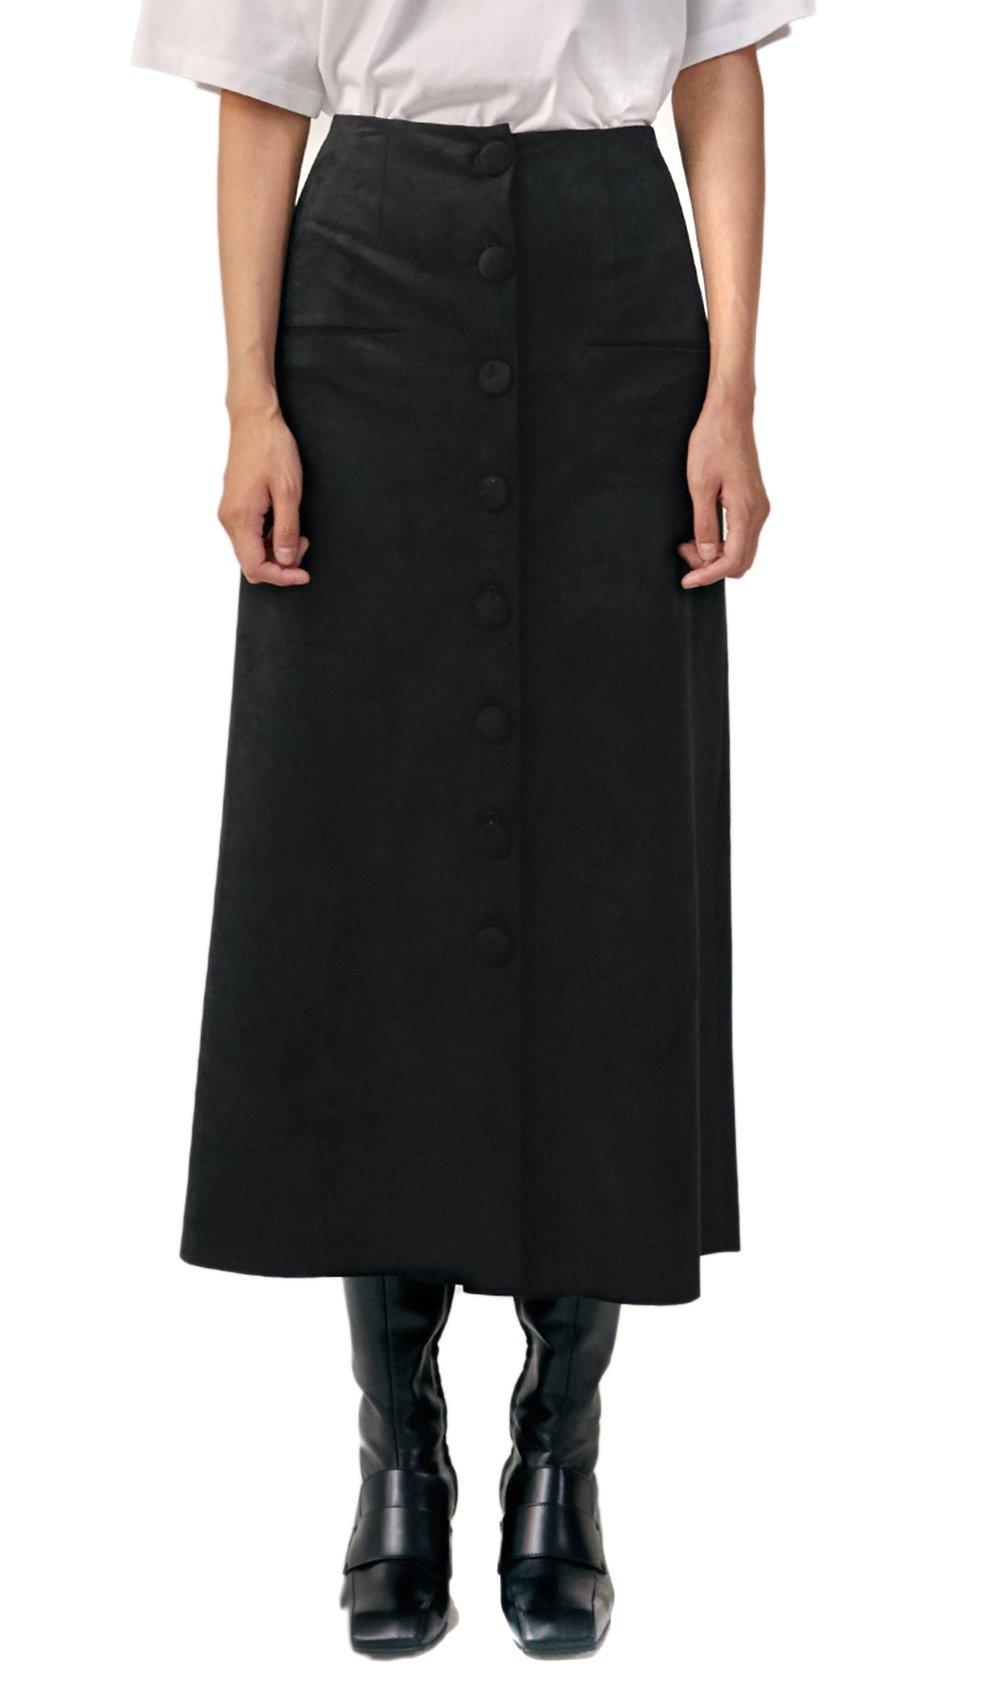 LOW CLASSIC Women's Black Button Detailed Long Suede A-Line Skirt S Black